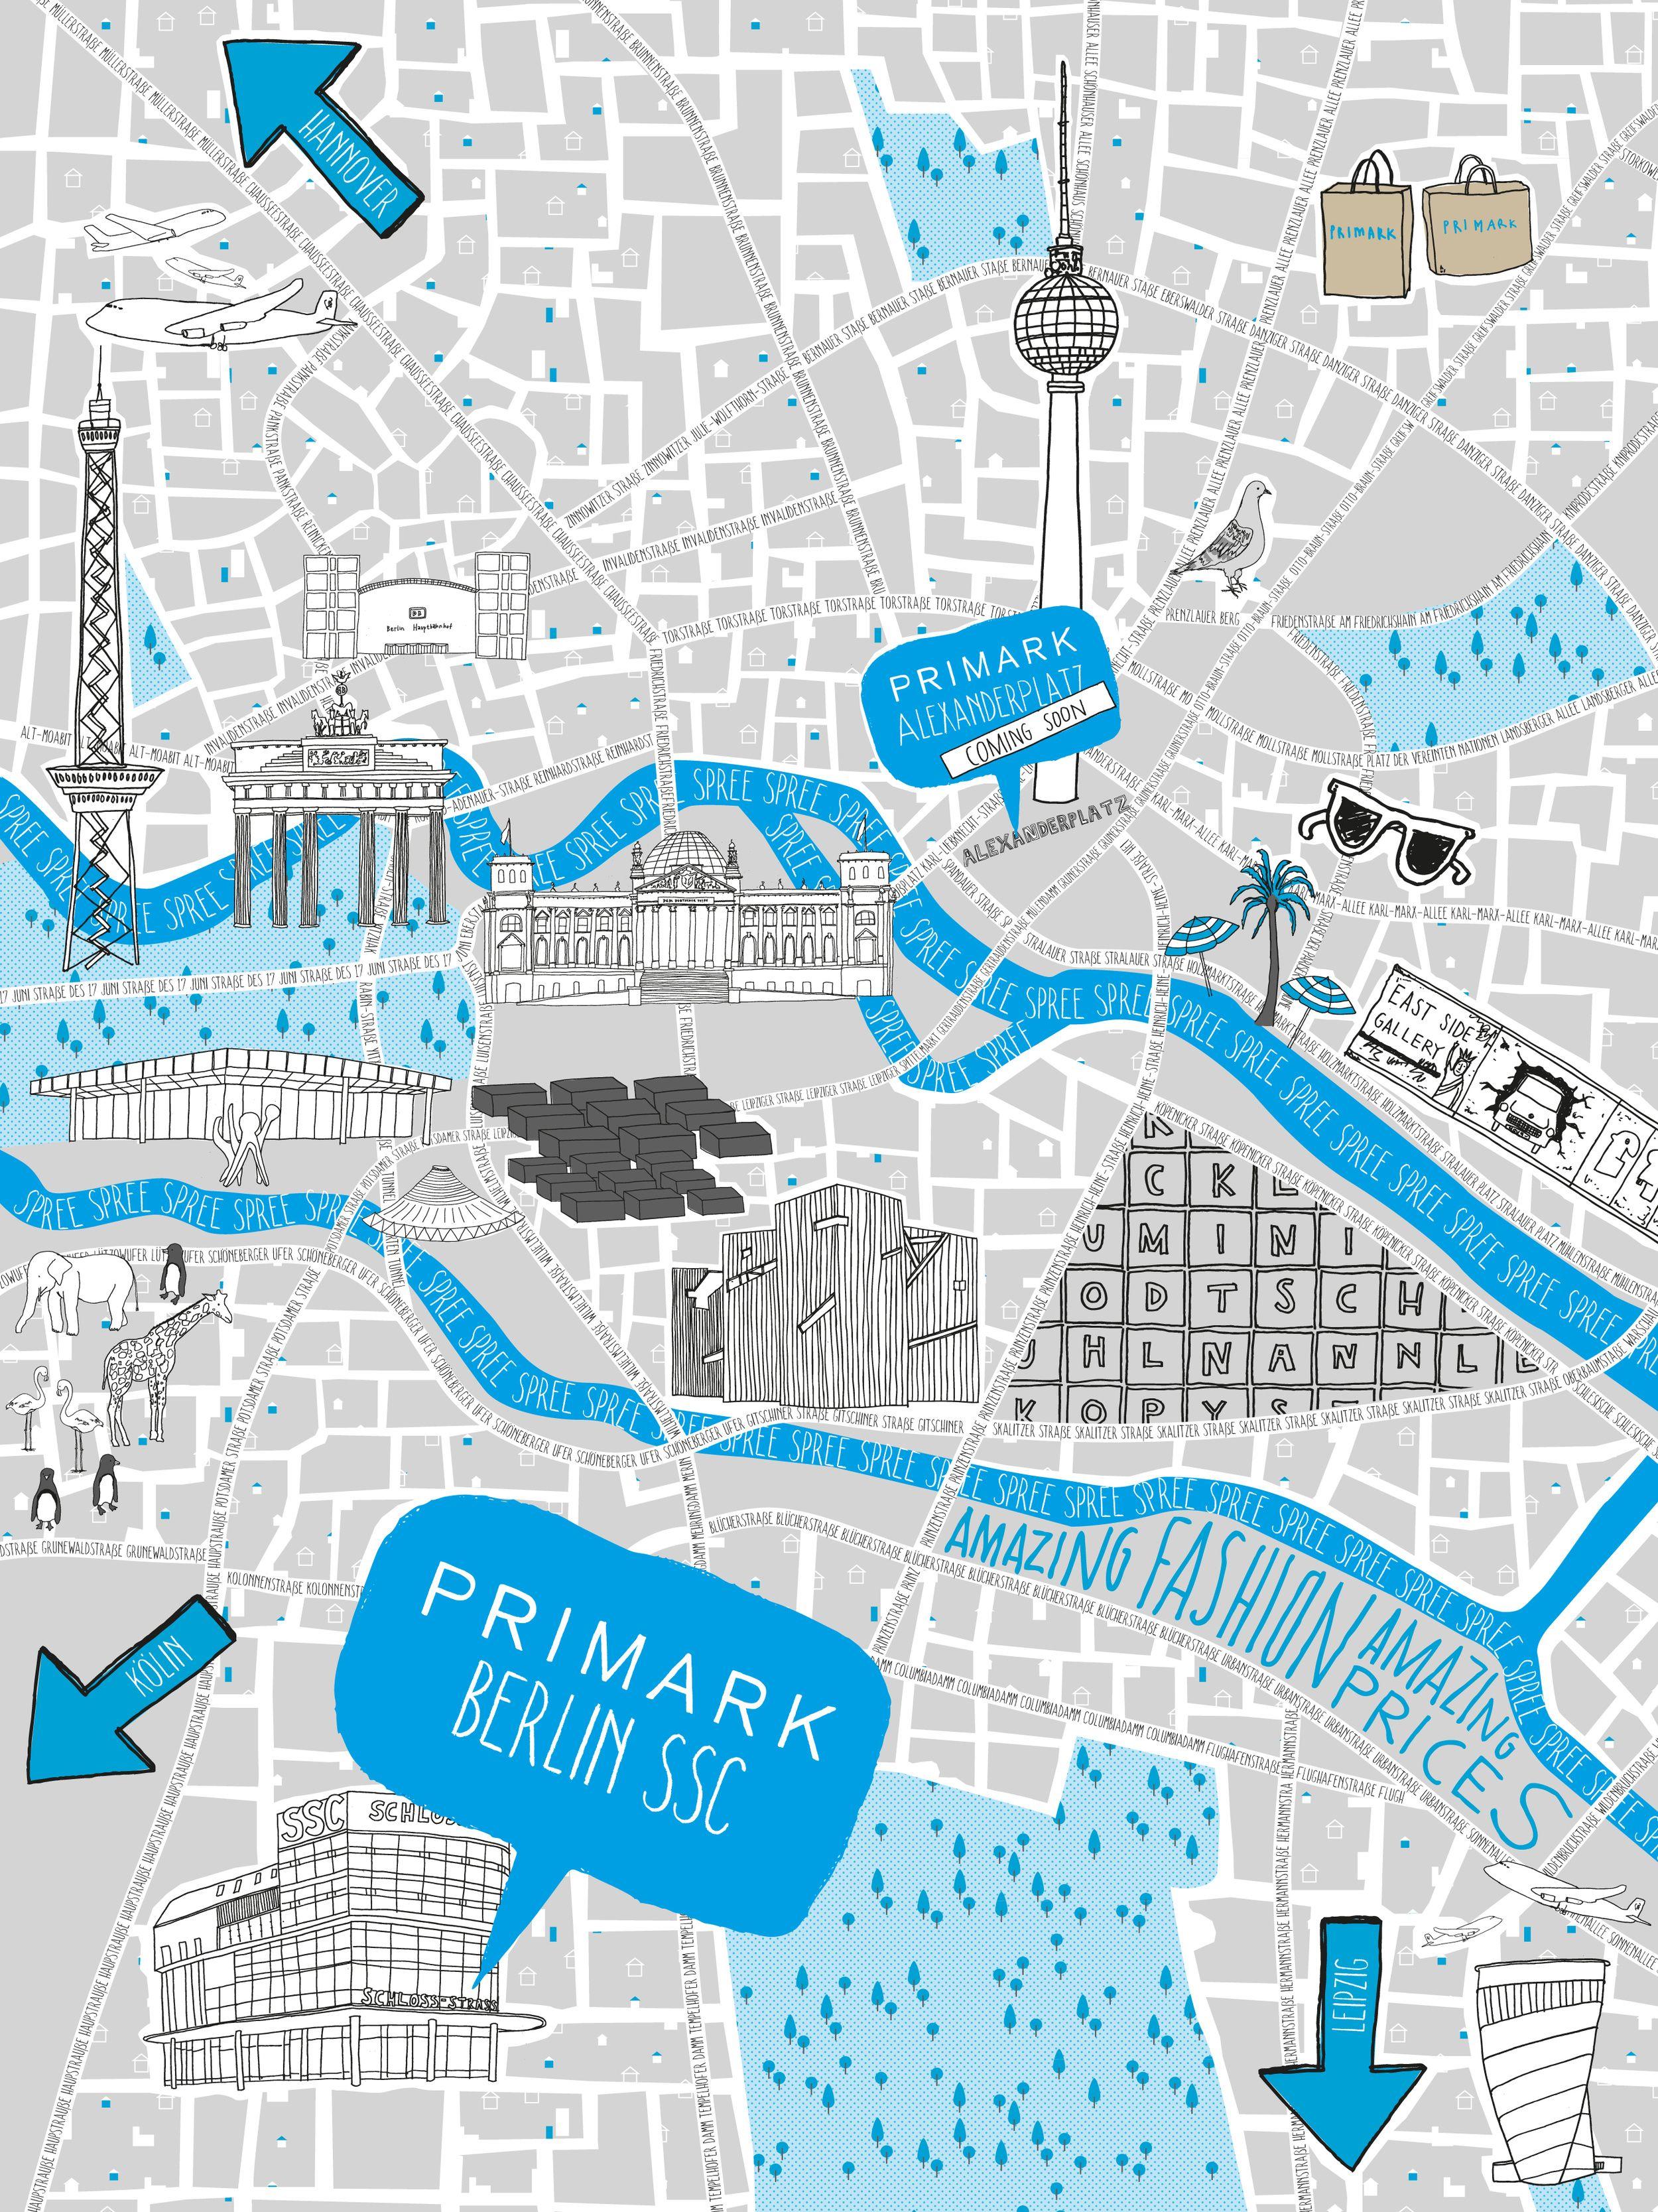 Primark Illustrated Map Berlin Eleanor Stevenson Freelance Graphic Design Illustrated Map Projects